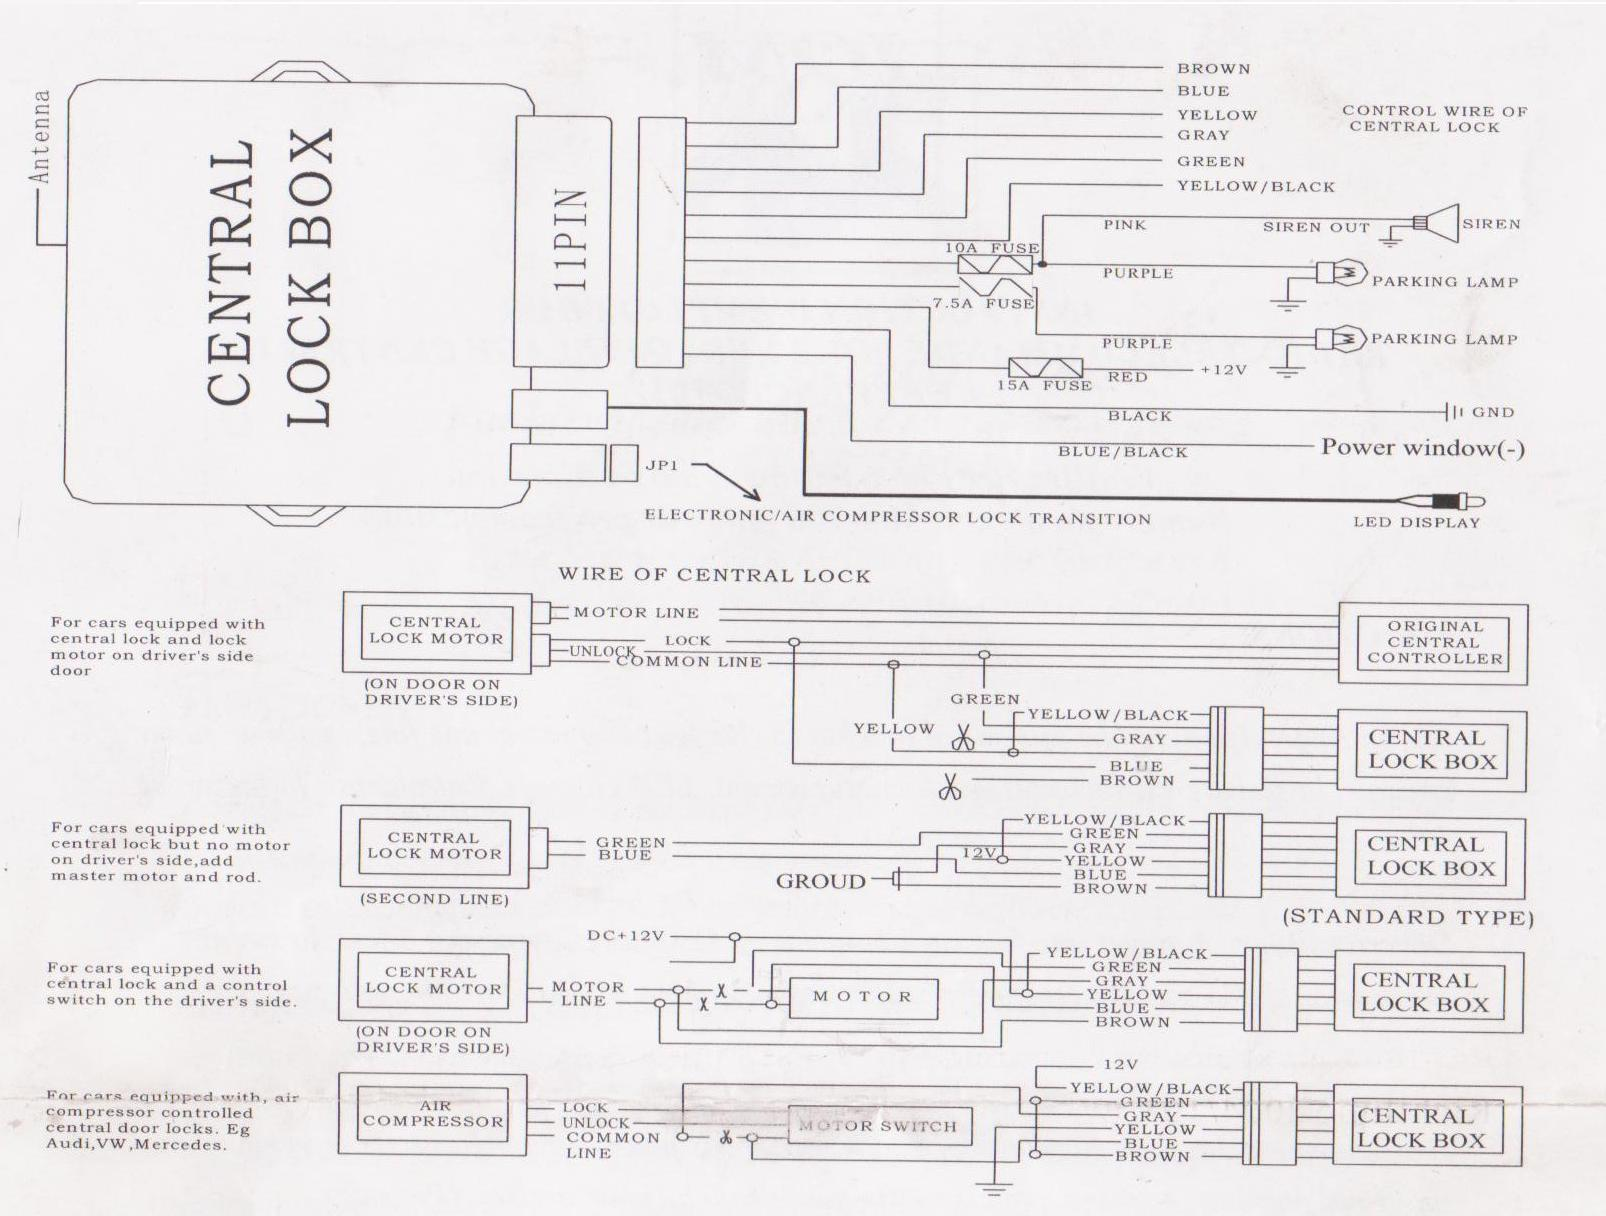 vw polo 9n central locking wiring diagram